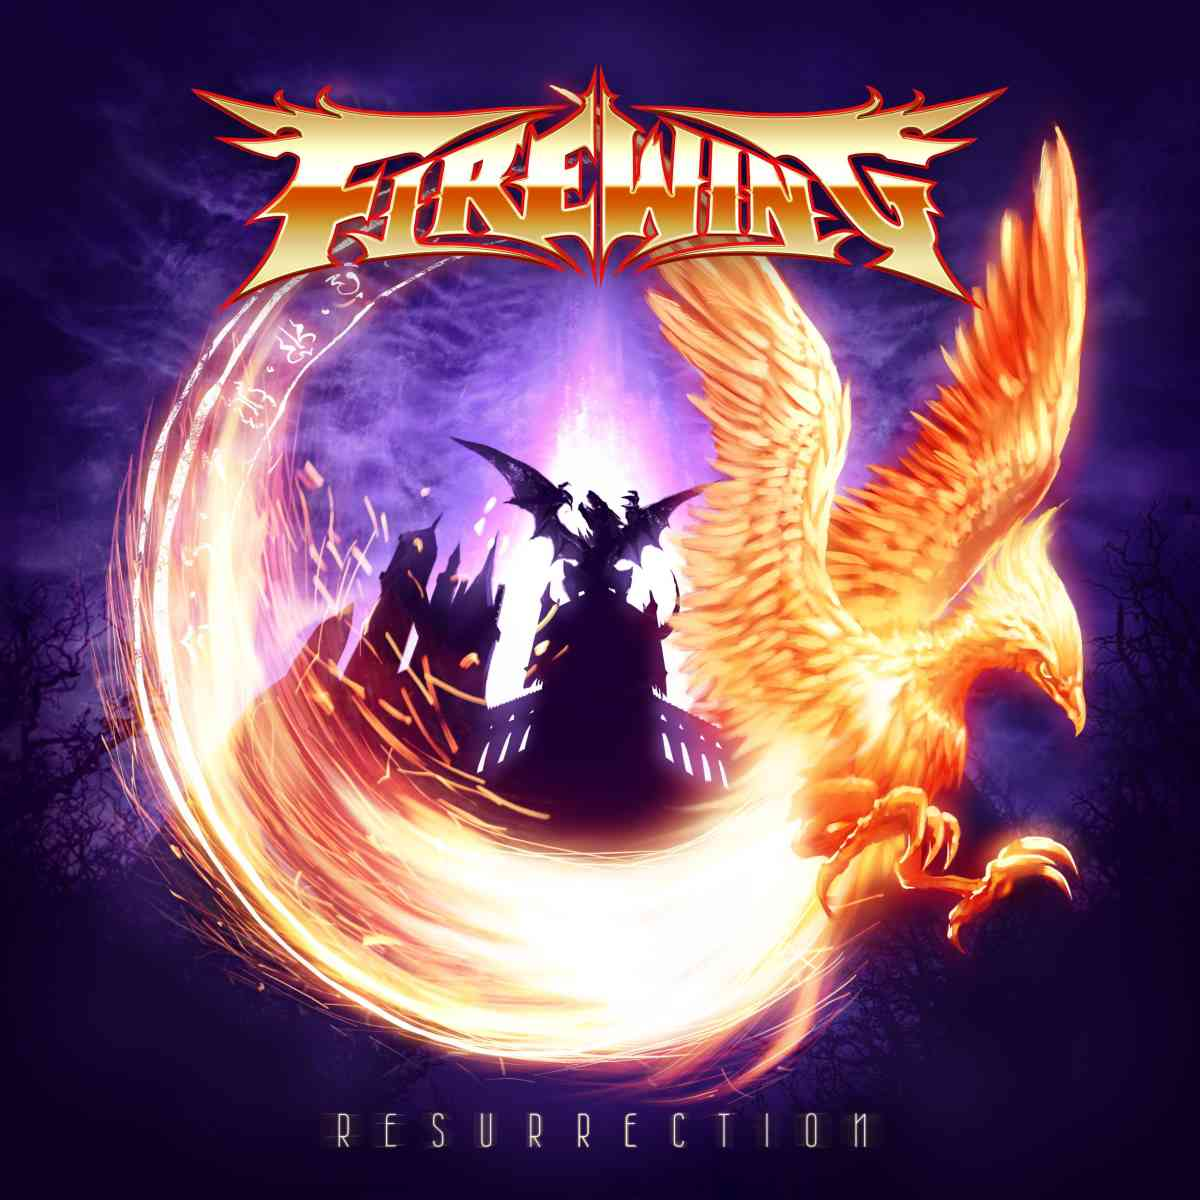 FireWing - Resurrection - album cover